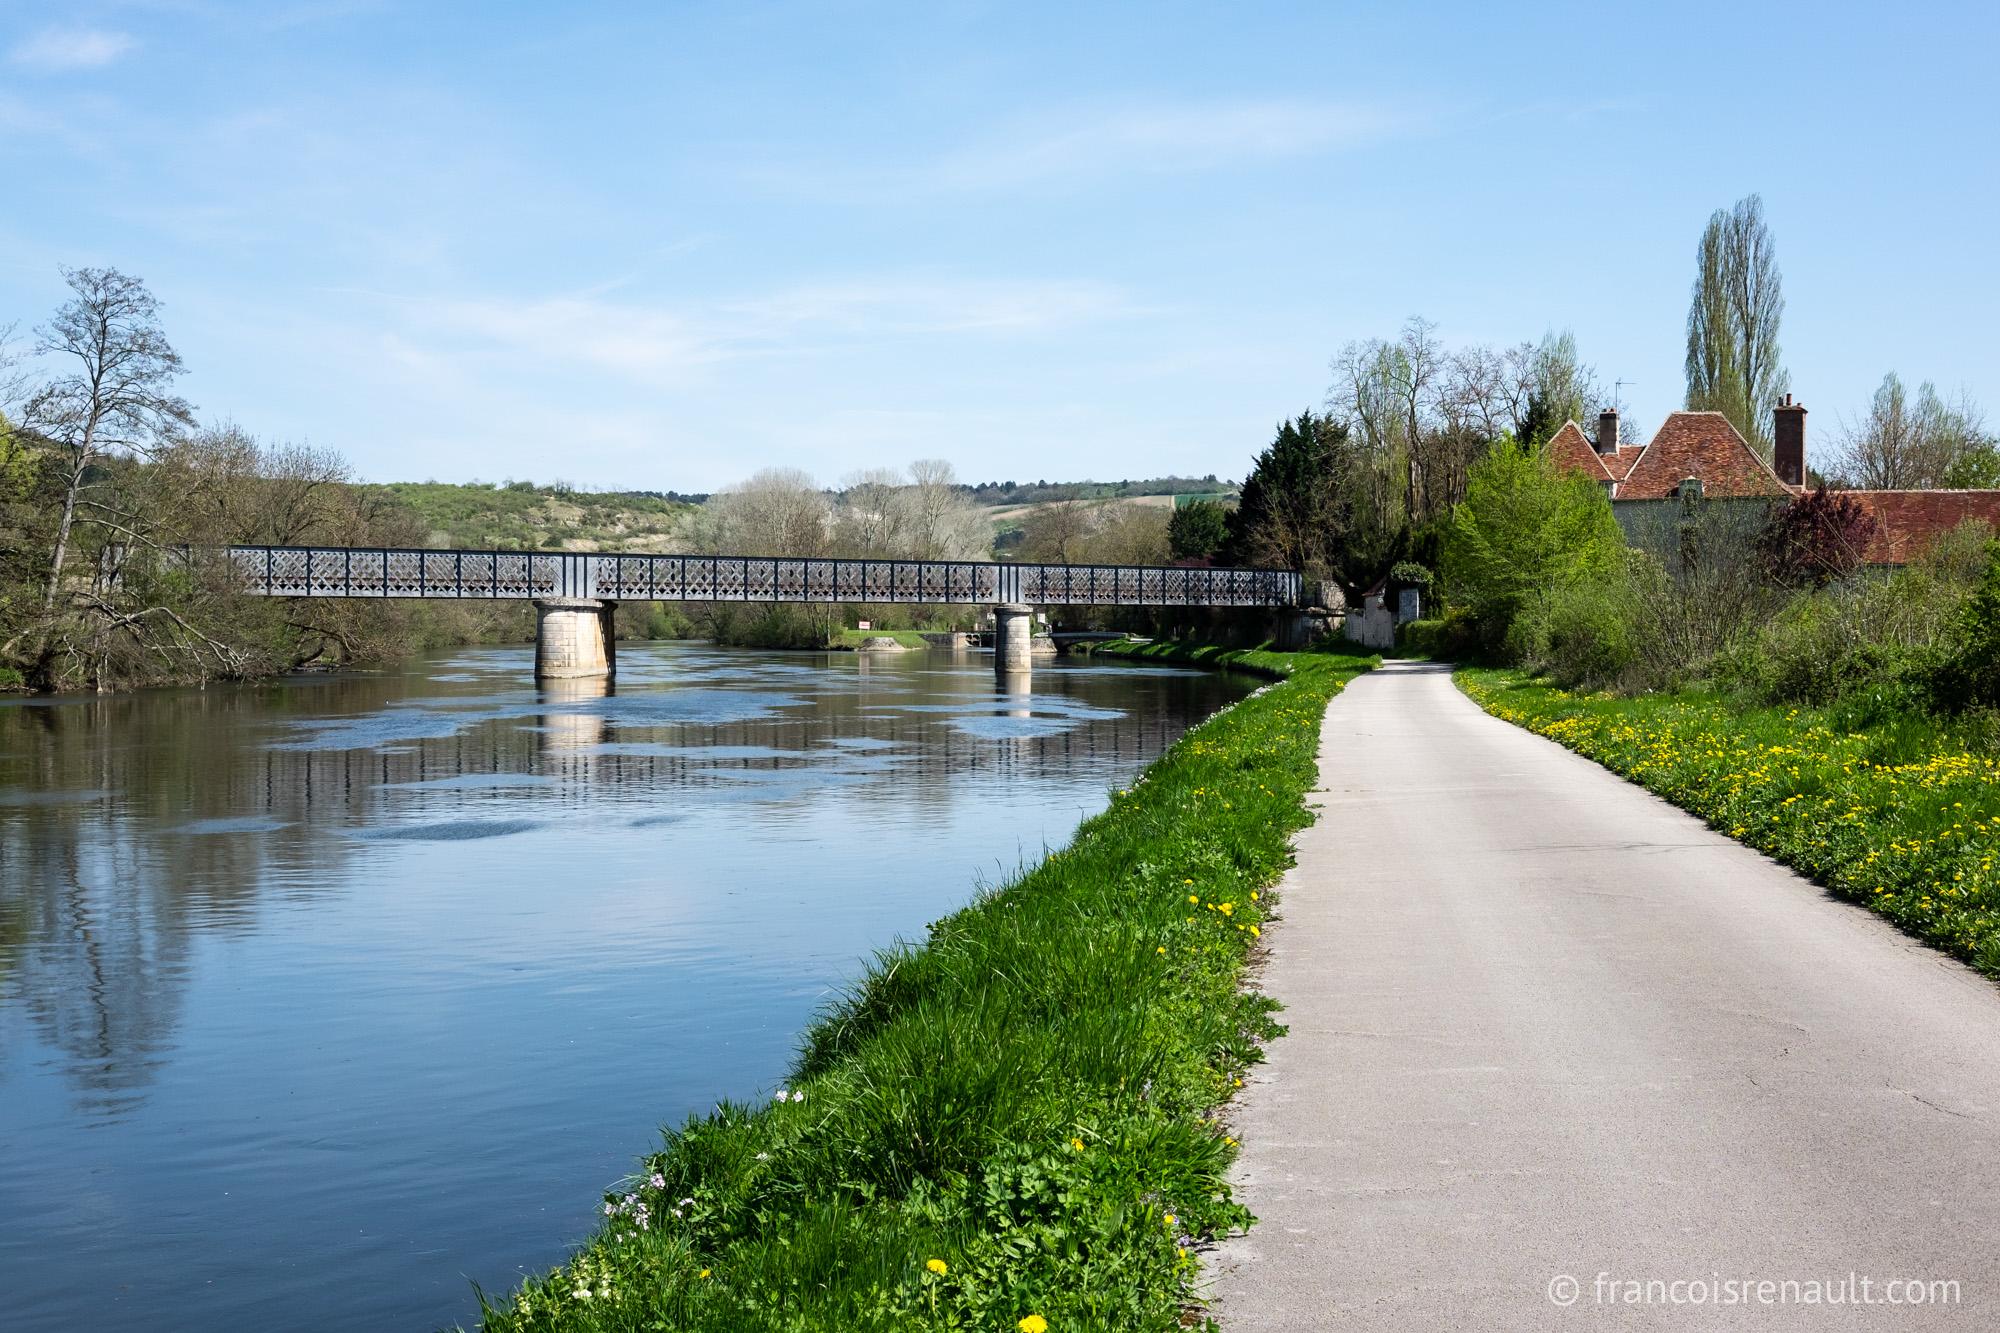 Canal-Nivernais-Francois-Renault-02